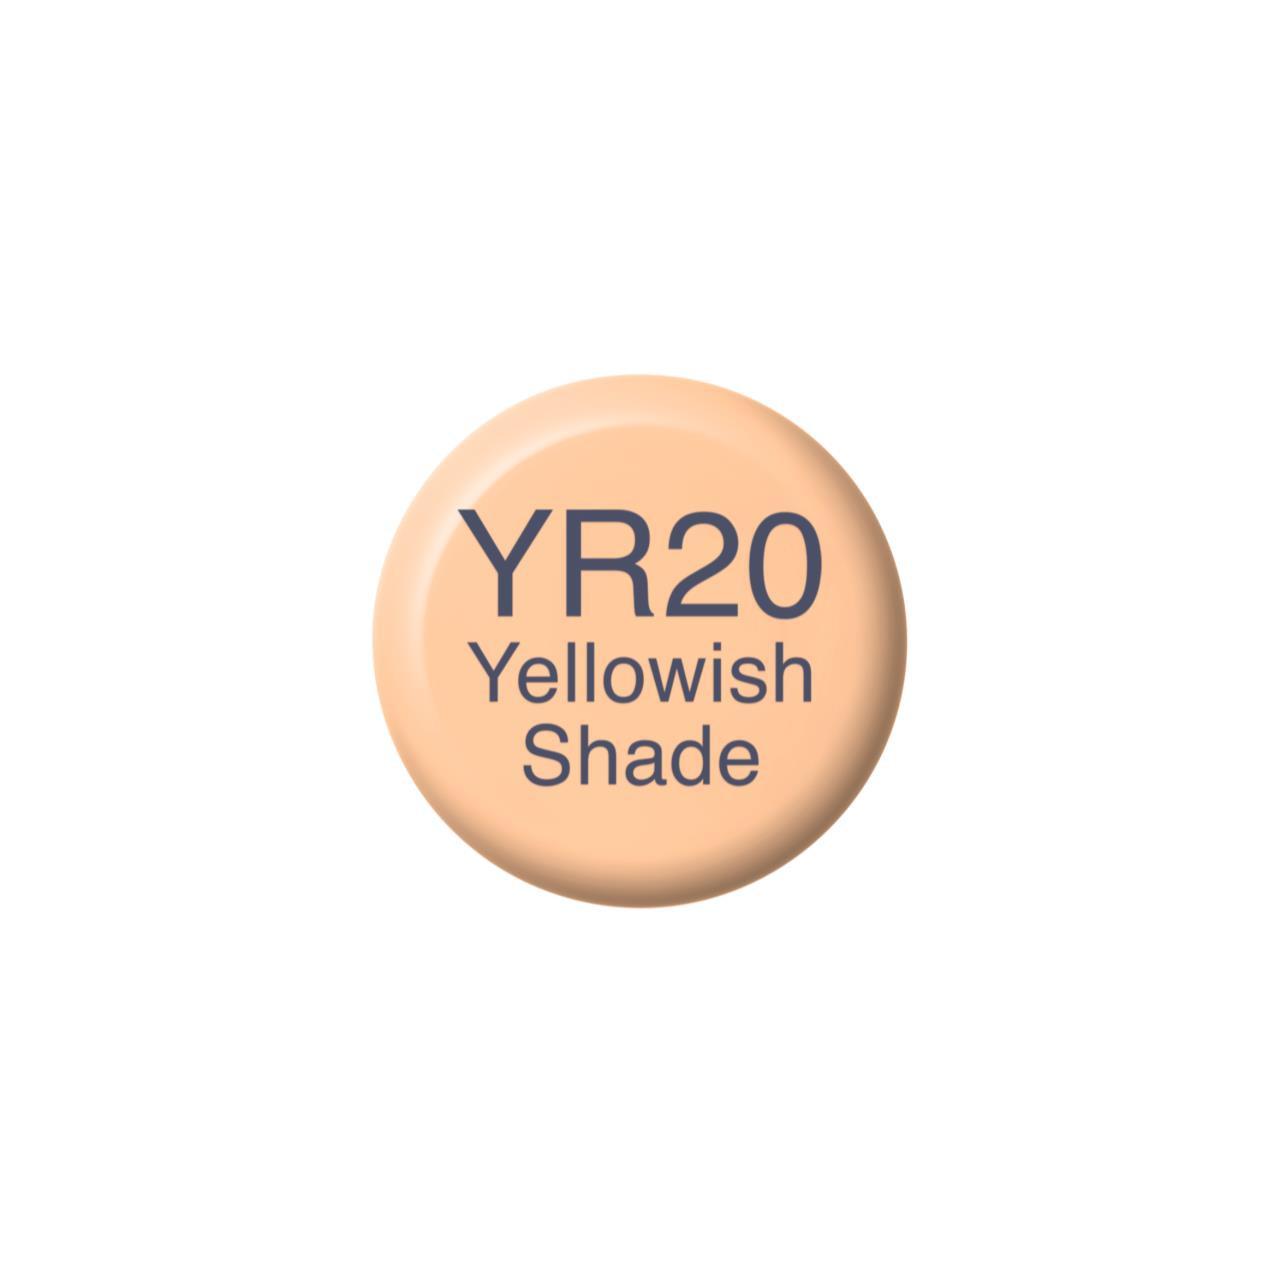 YR20 Yellowish Shade, Copic Ink - 4511338058701